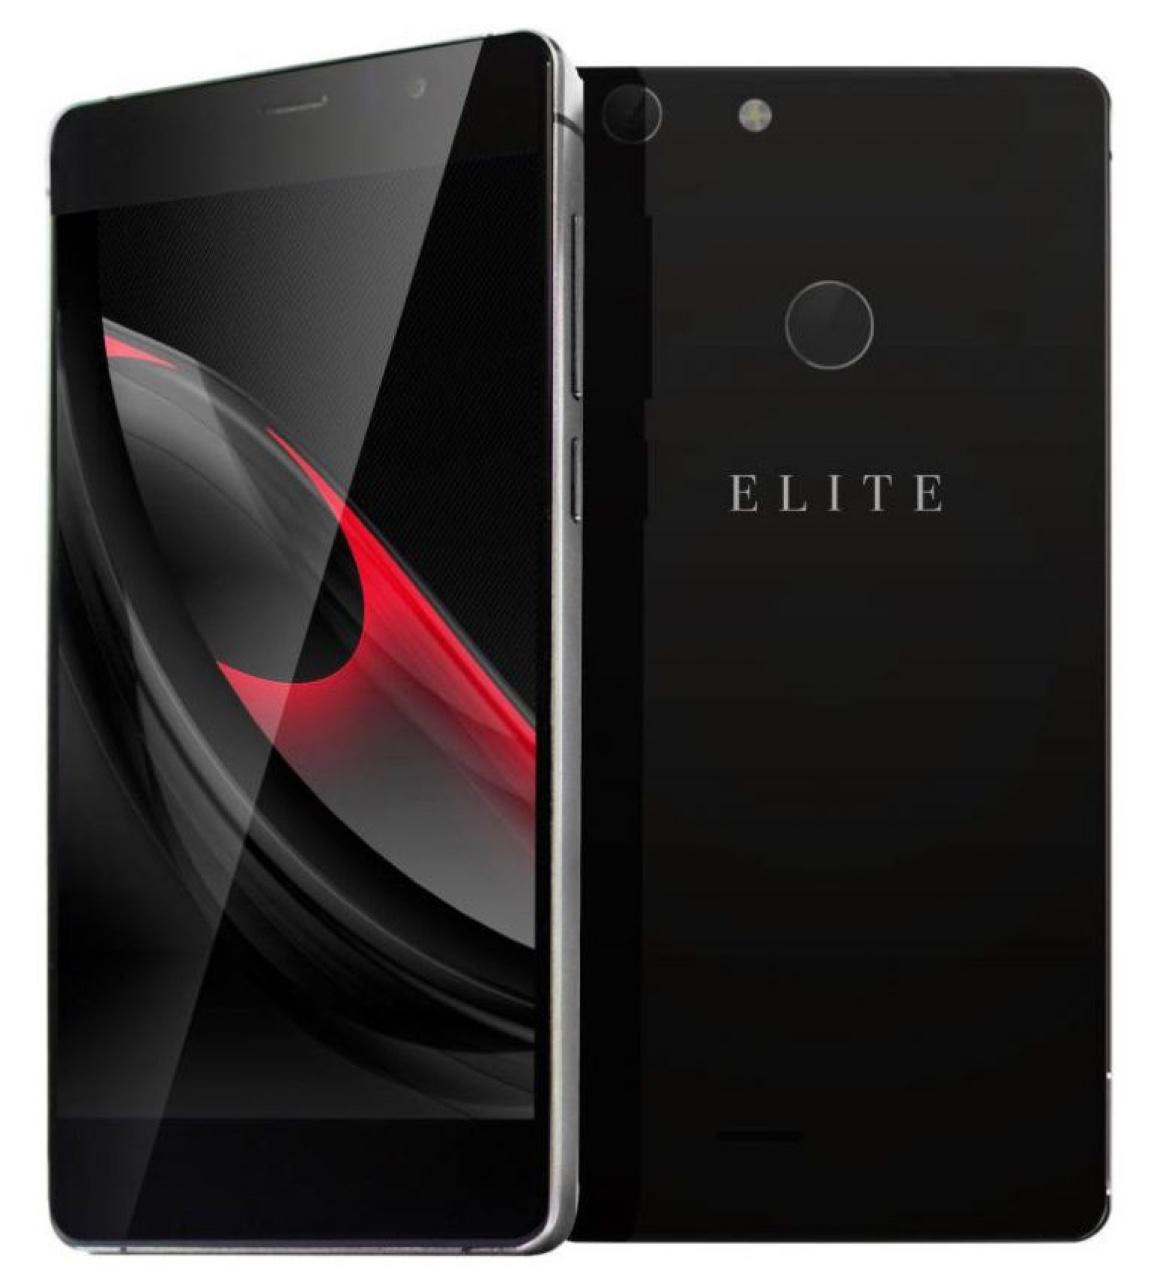 Swipe Elite Max Android アンドロイド スマートフォン スマホ スペック 性能 2016年